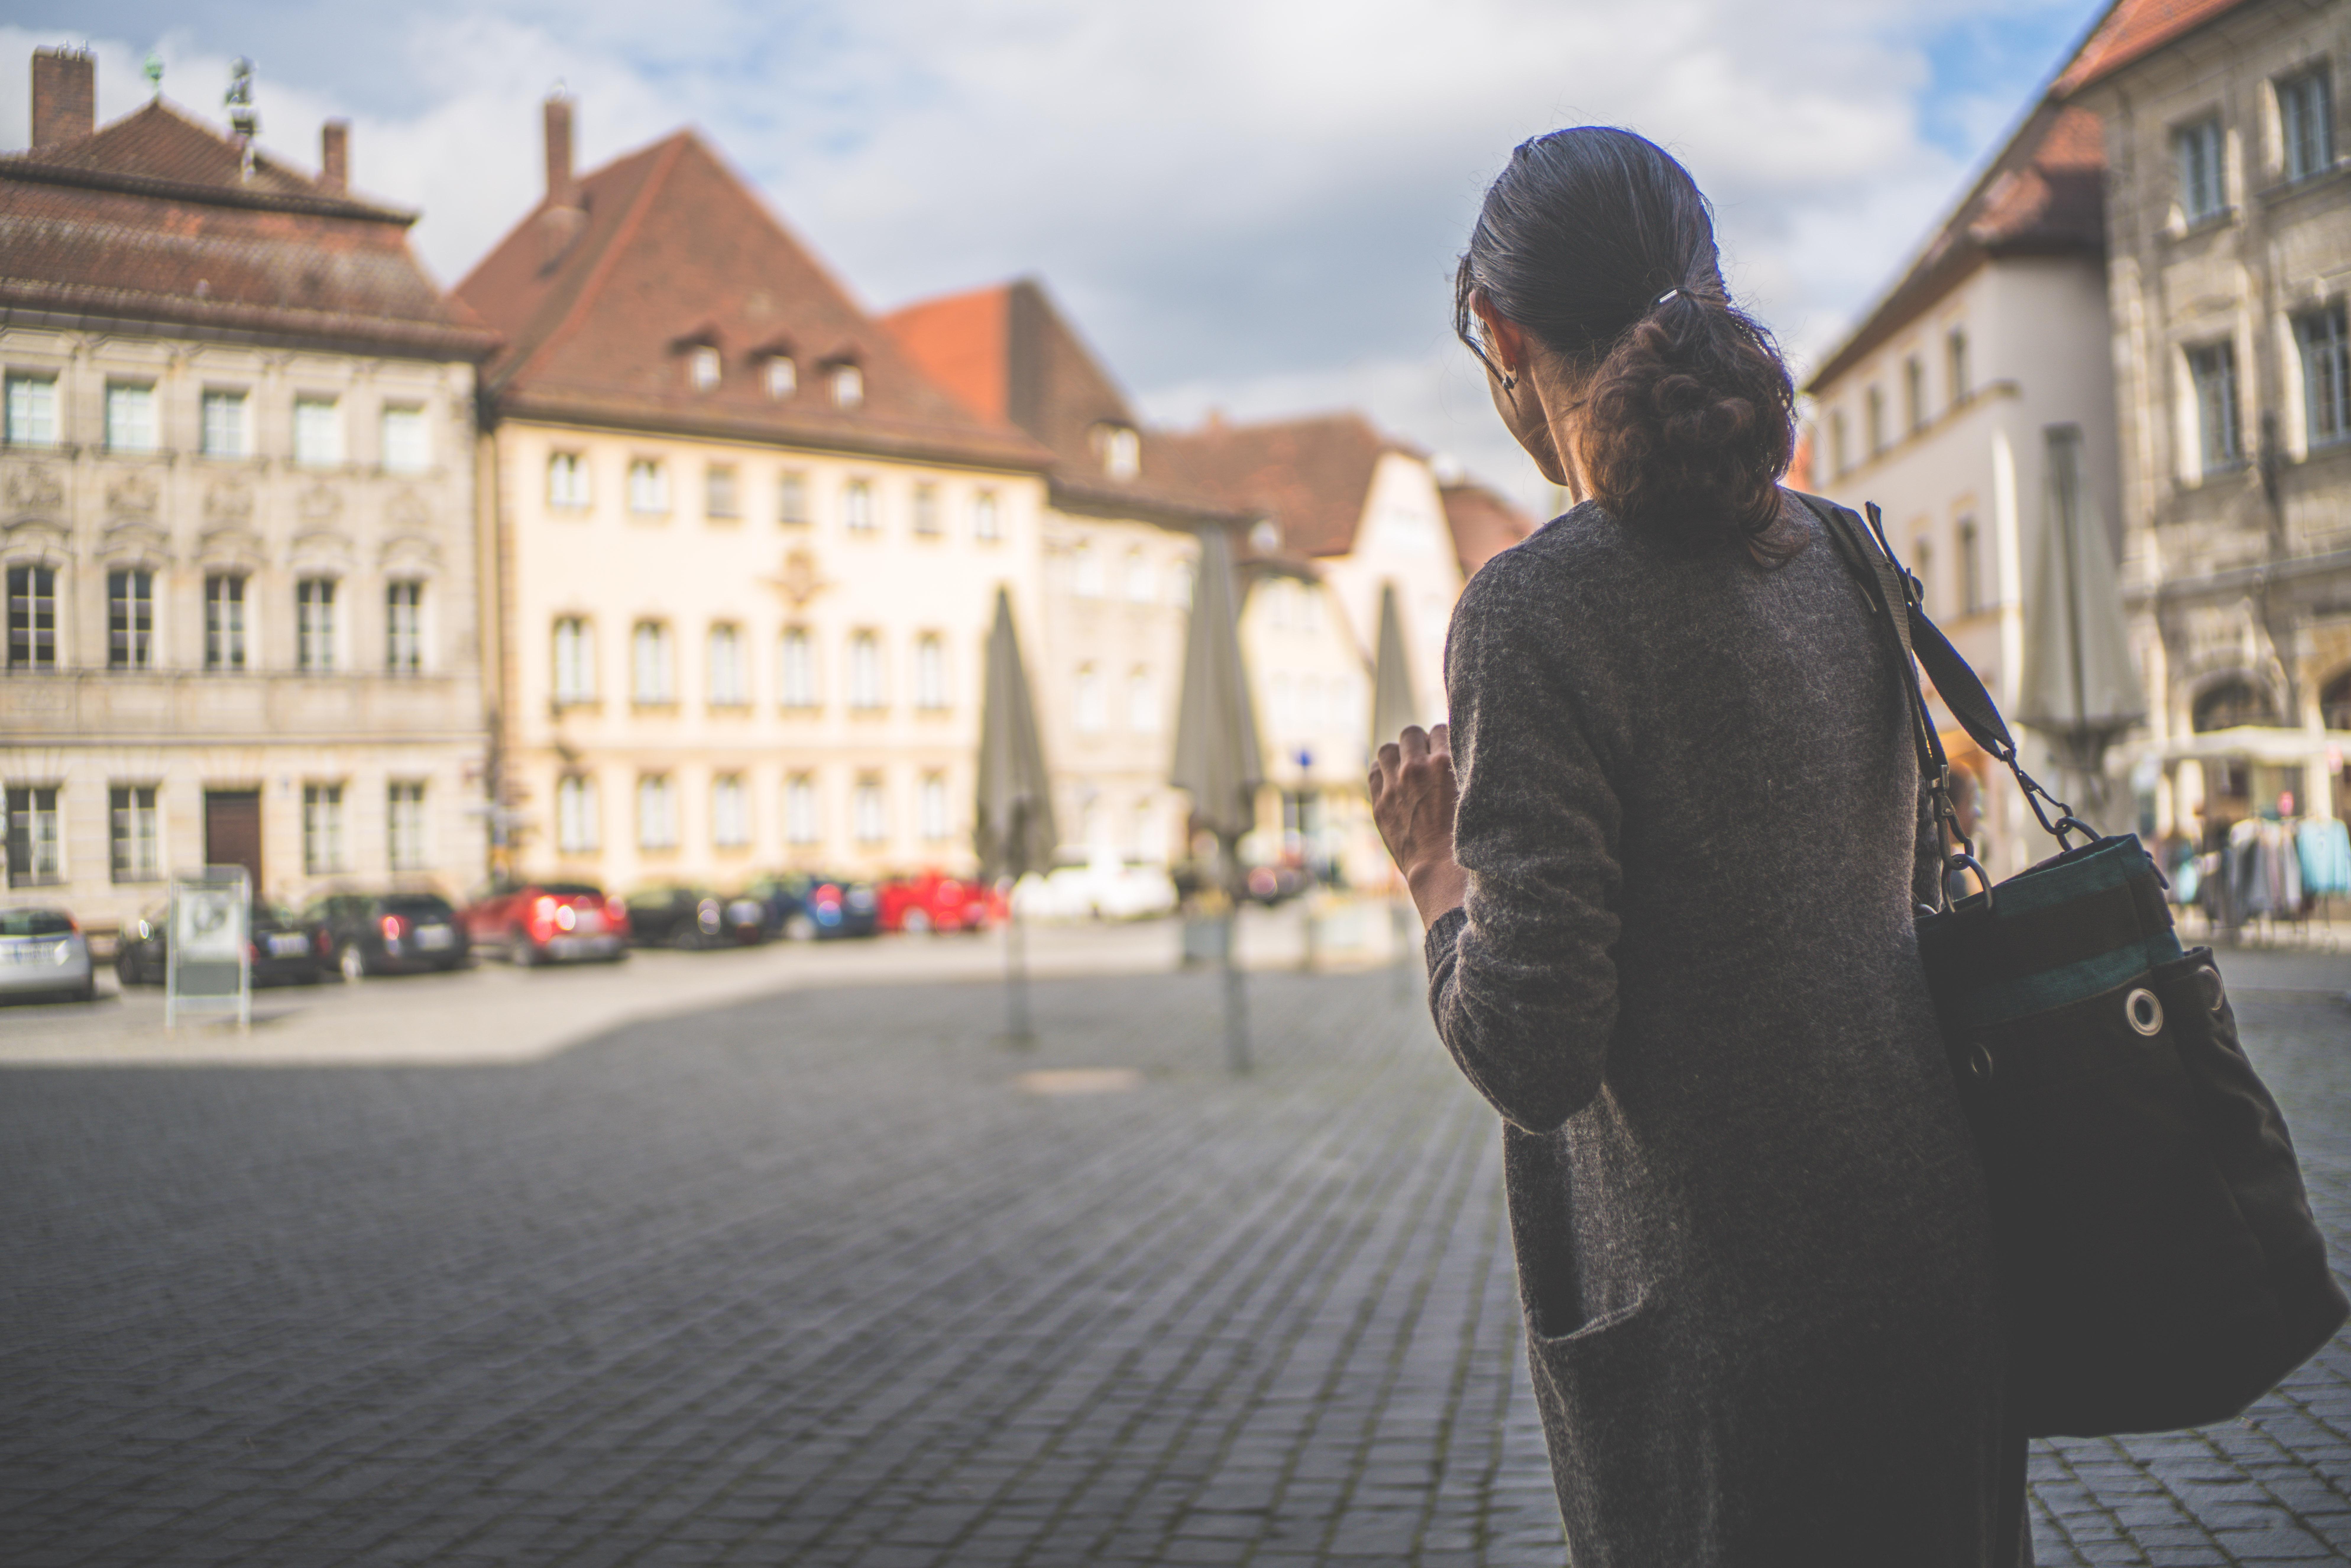 Free Images : pedestrian, girl, road, street, city, urban, travel ...